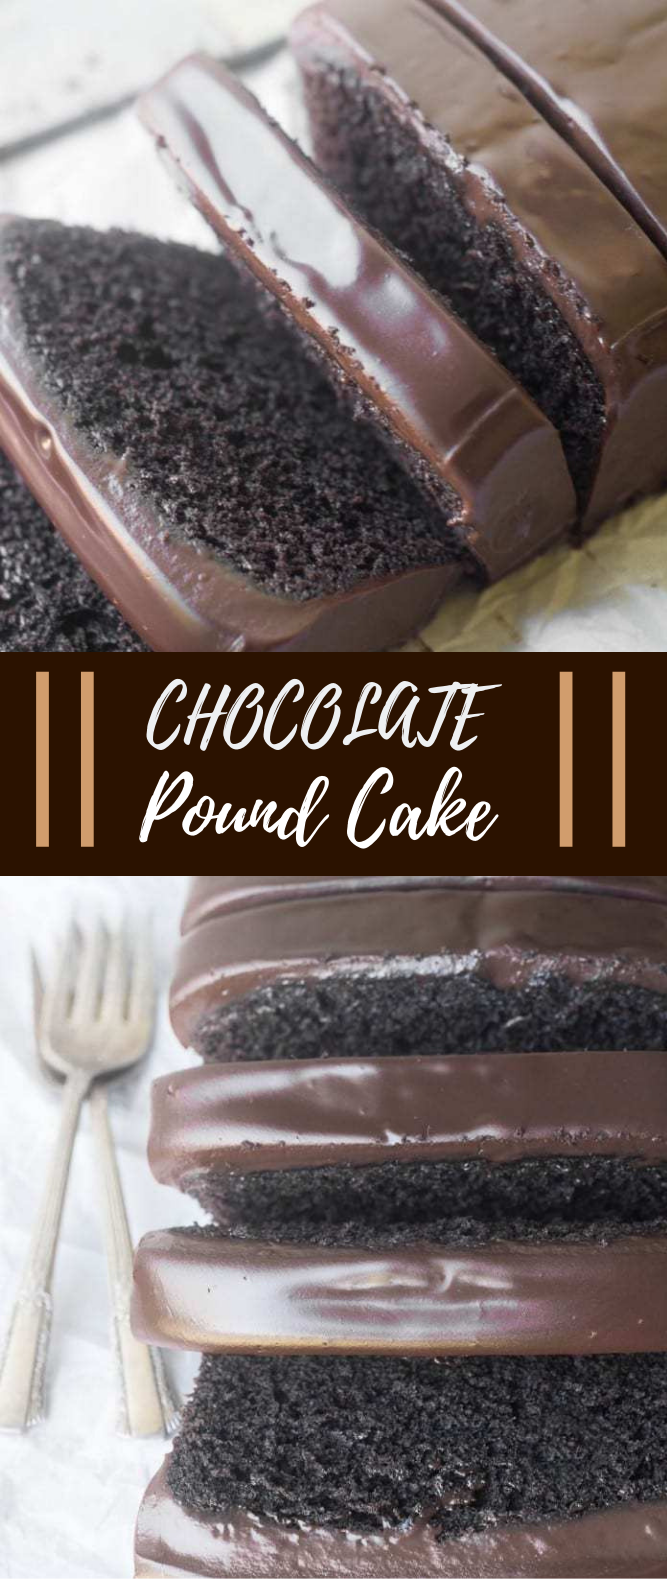 CHOCOLATE POUND CAKE #Dessert #Choco